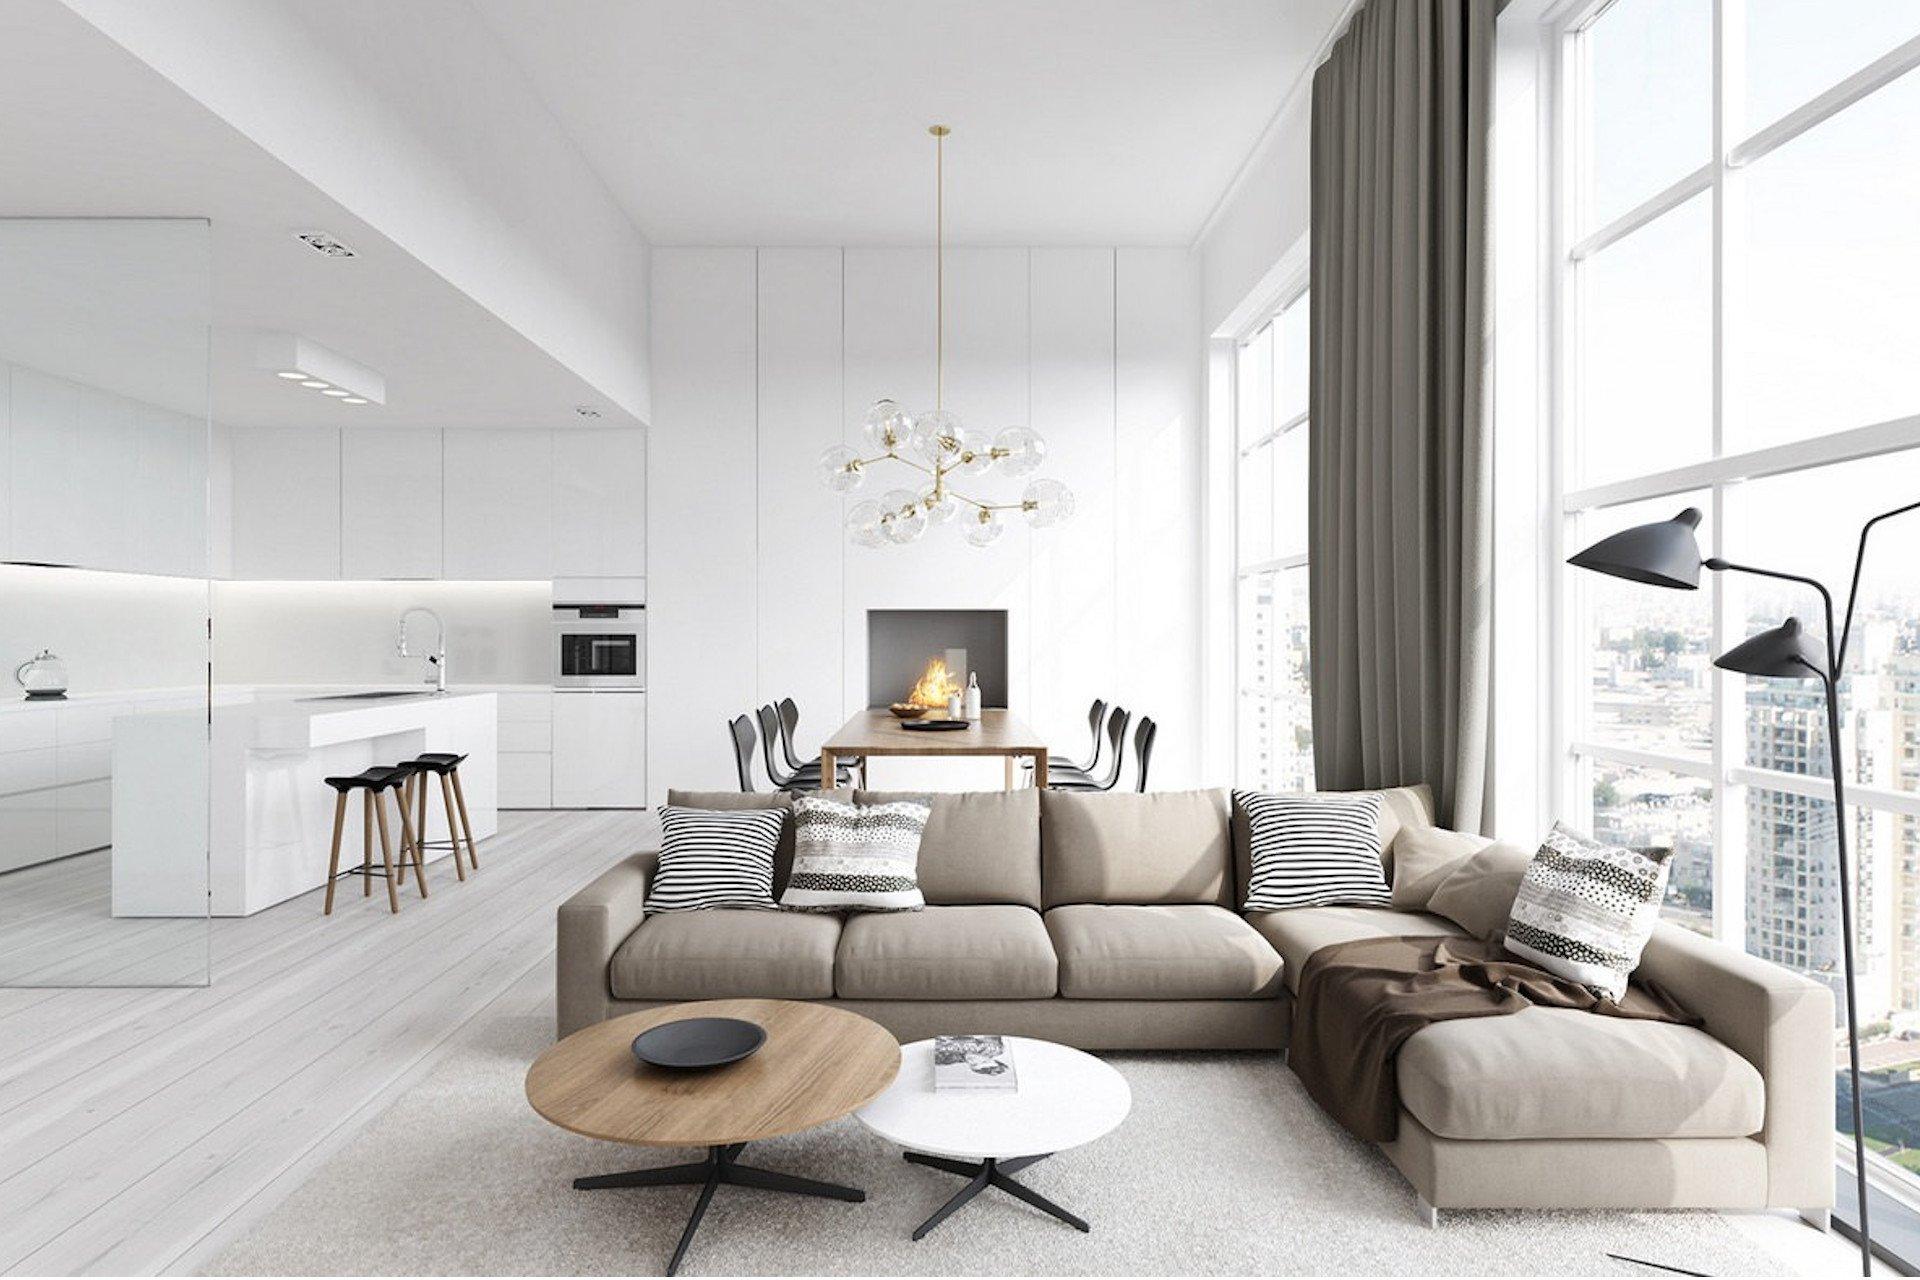 Consigli Per La Casa 10 consigli originali per una casa sempre in ordine - crumbs